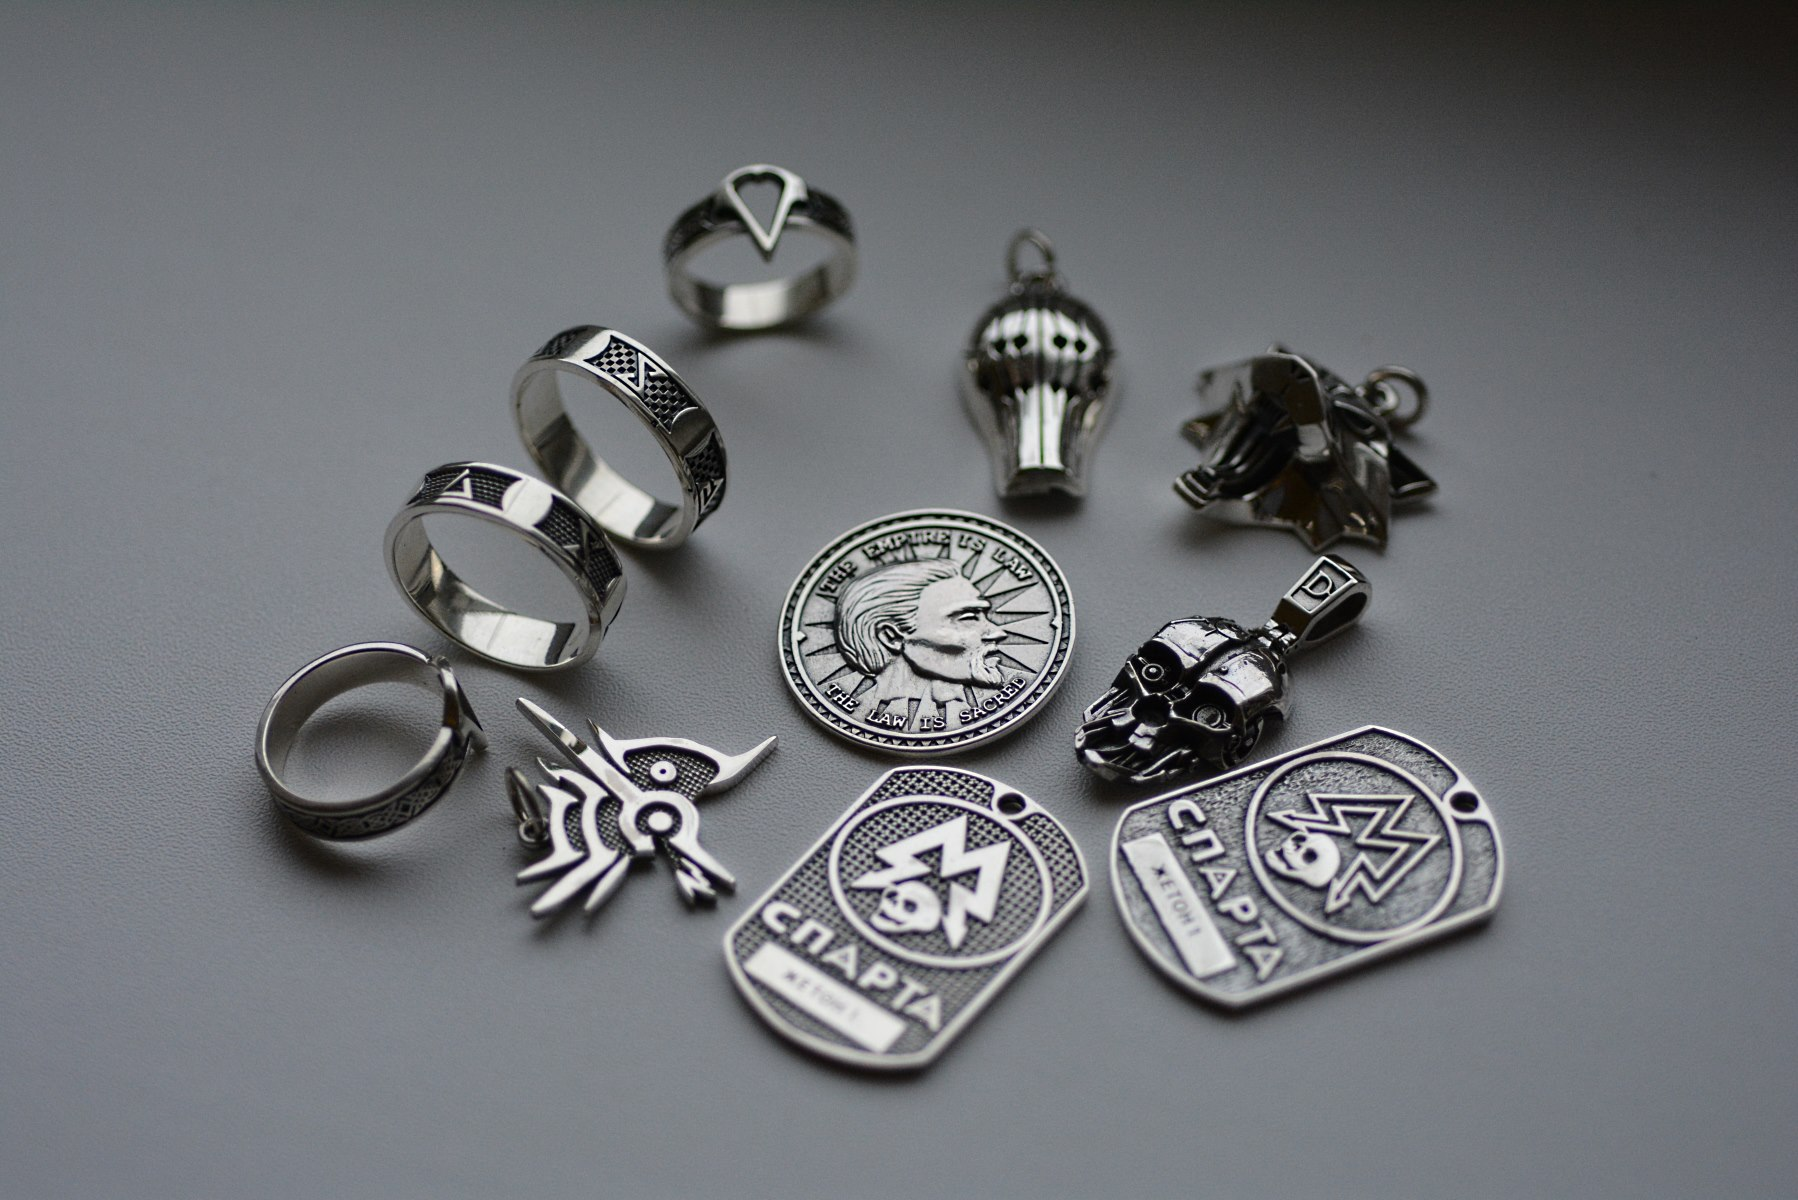 gemer jewelry worldofjewelcraf123344